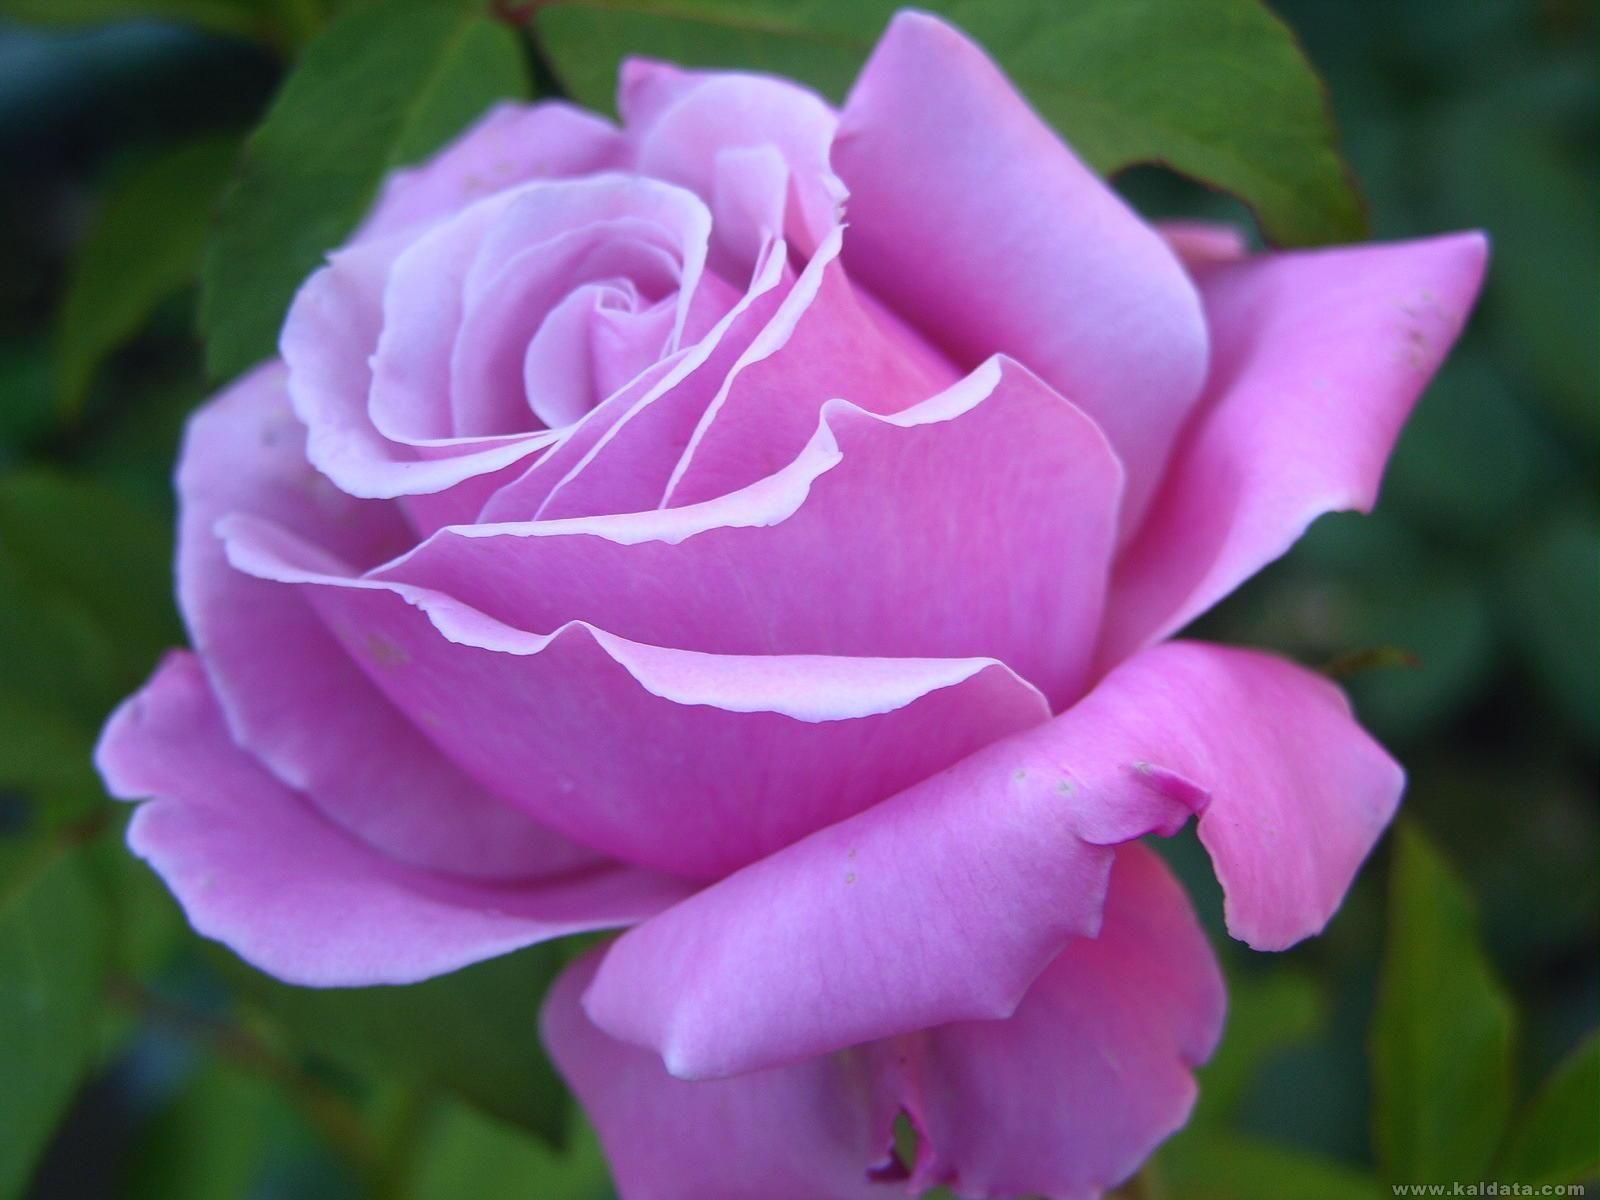 rose41.jpg